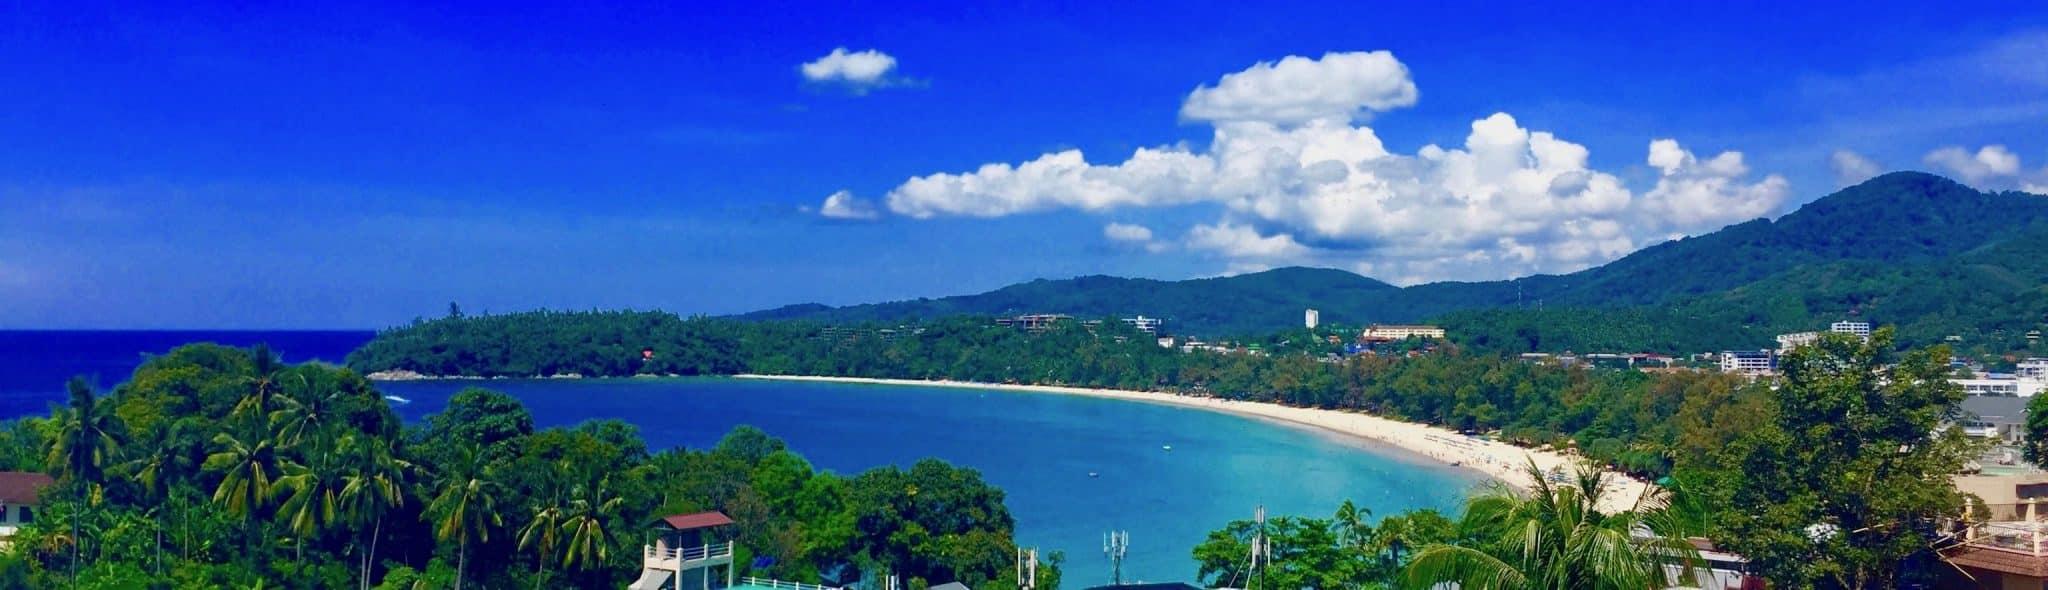 Thailandia incontri vacanze